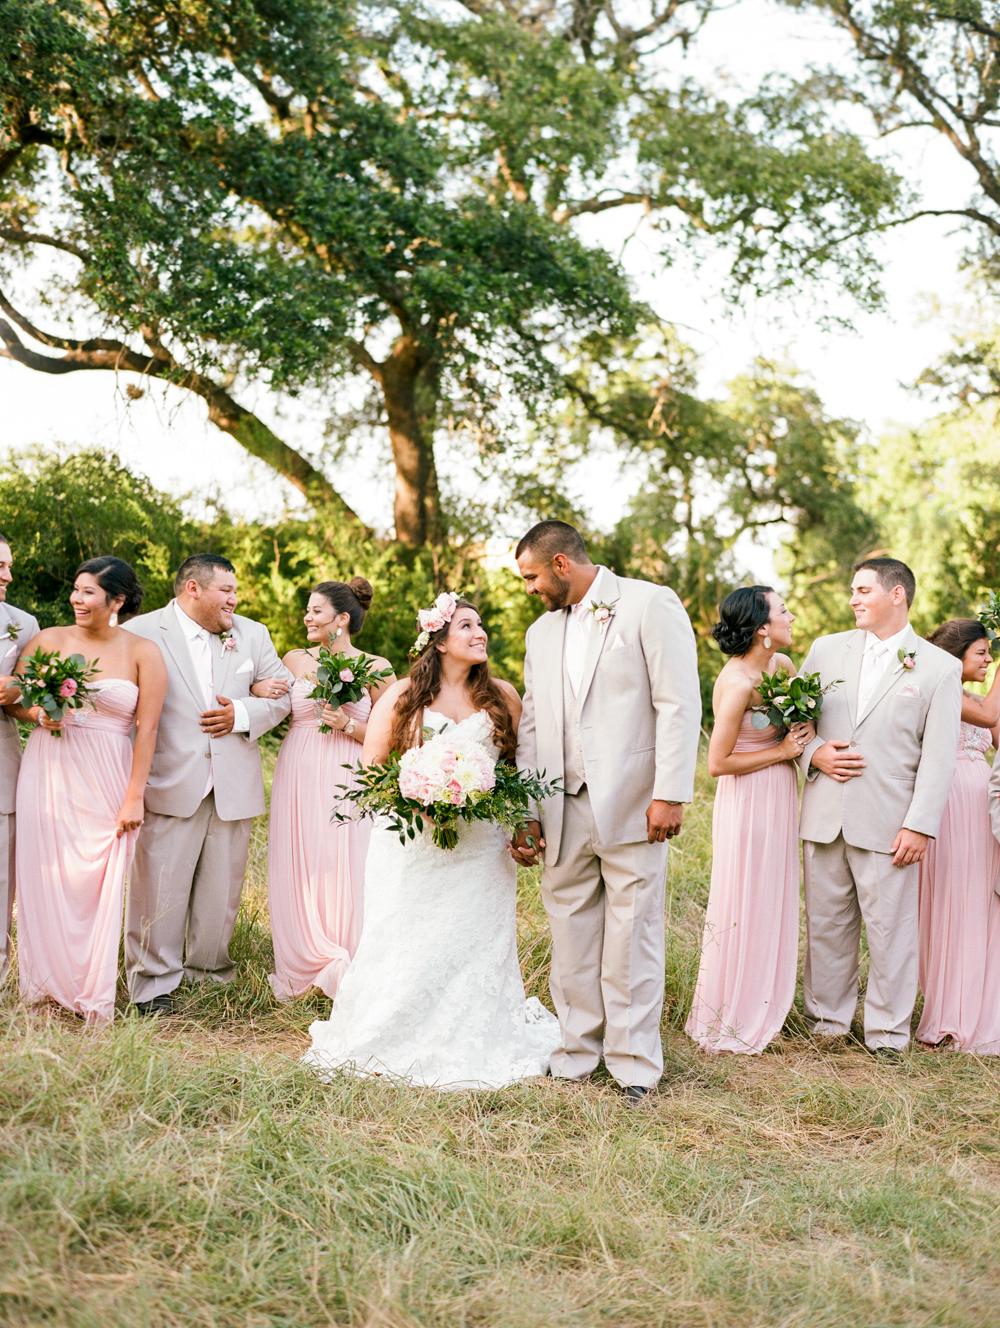 dana fernandez photography austin wedding photographer the vista on seward hill destination film-28.jpg